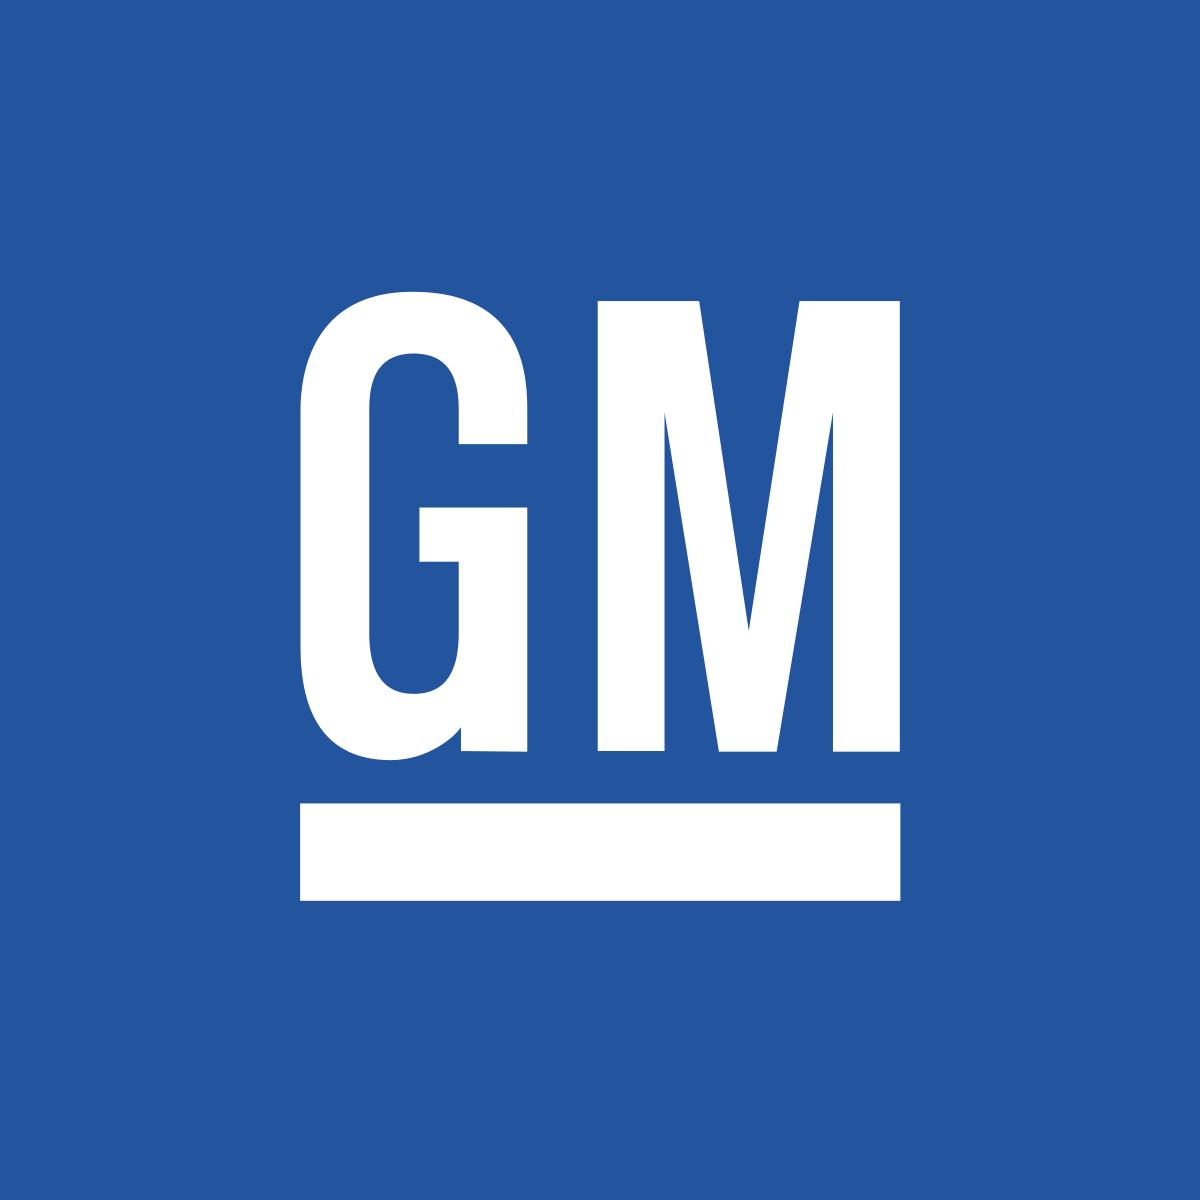 https://upload.wikimedia.org/wikipedia/commons/thumb/d/d6/General_Motors_logo.svg/1200px-General_Motors_logo.svg.png